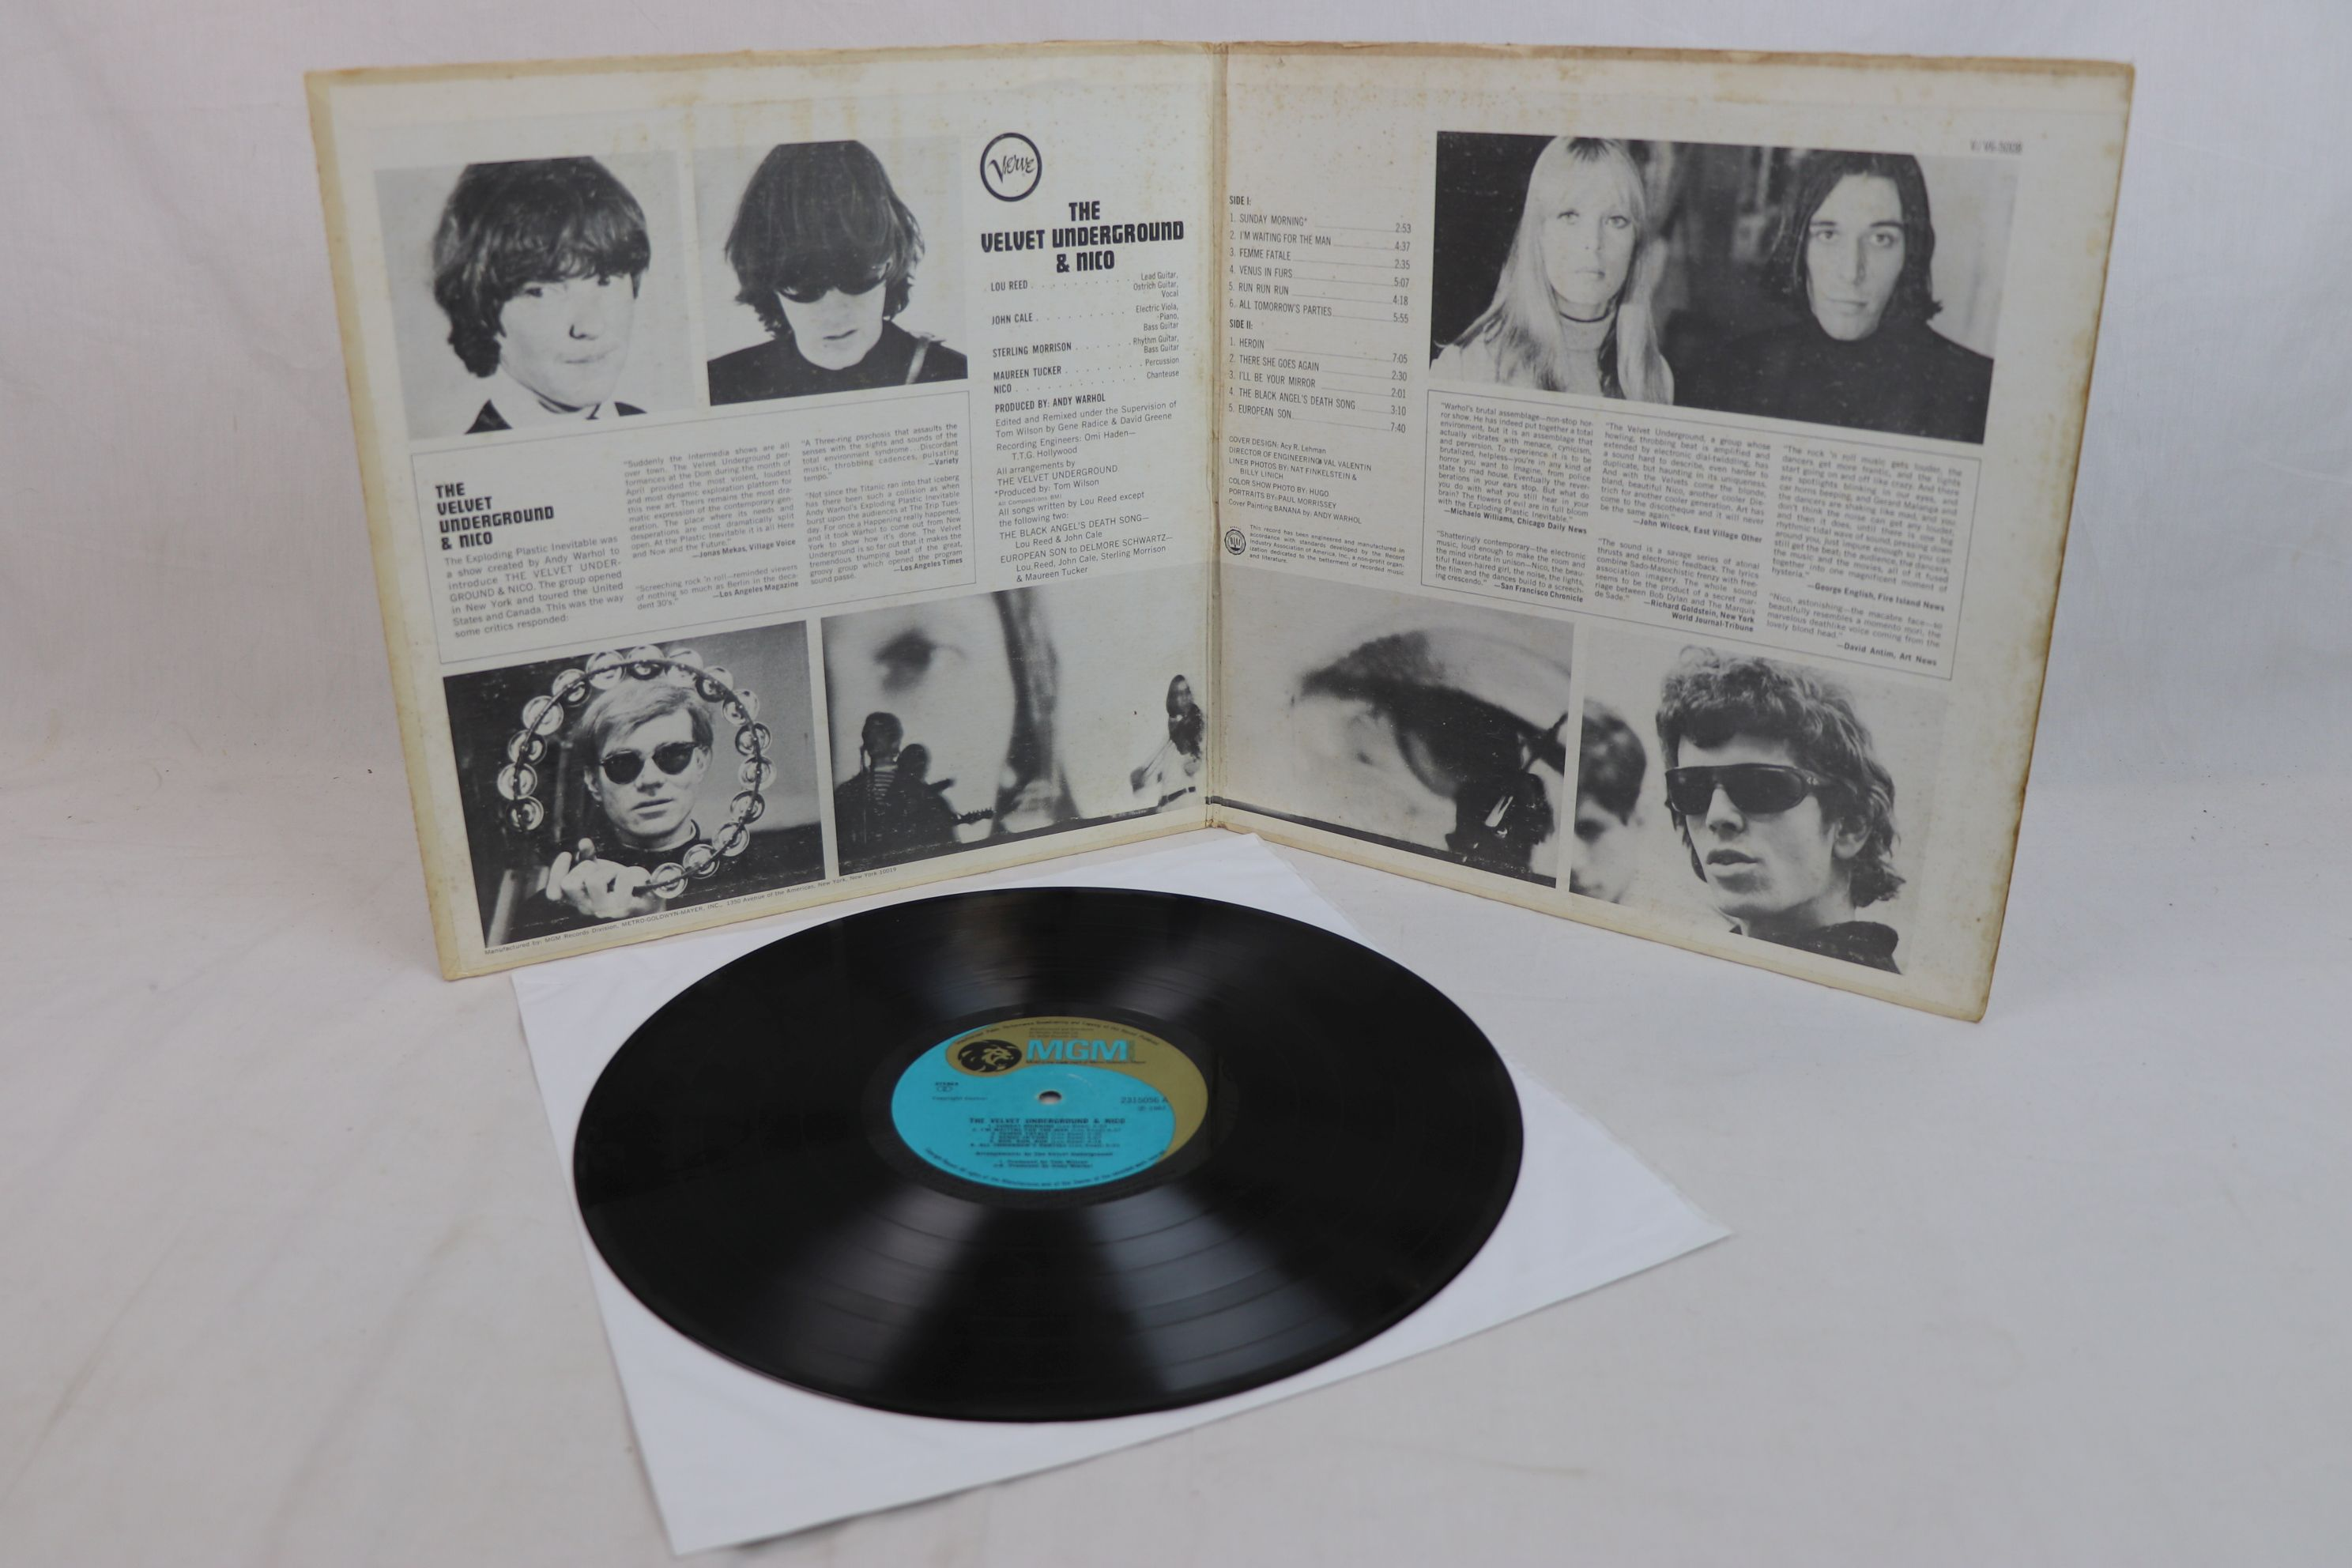 Vinyl The Velvet Underground Amp Nico On Verve 2315056